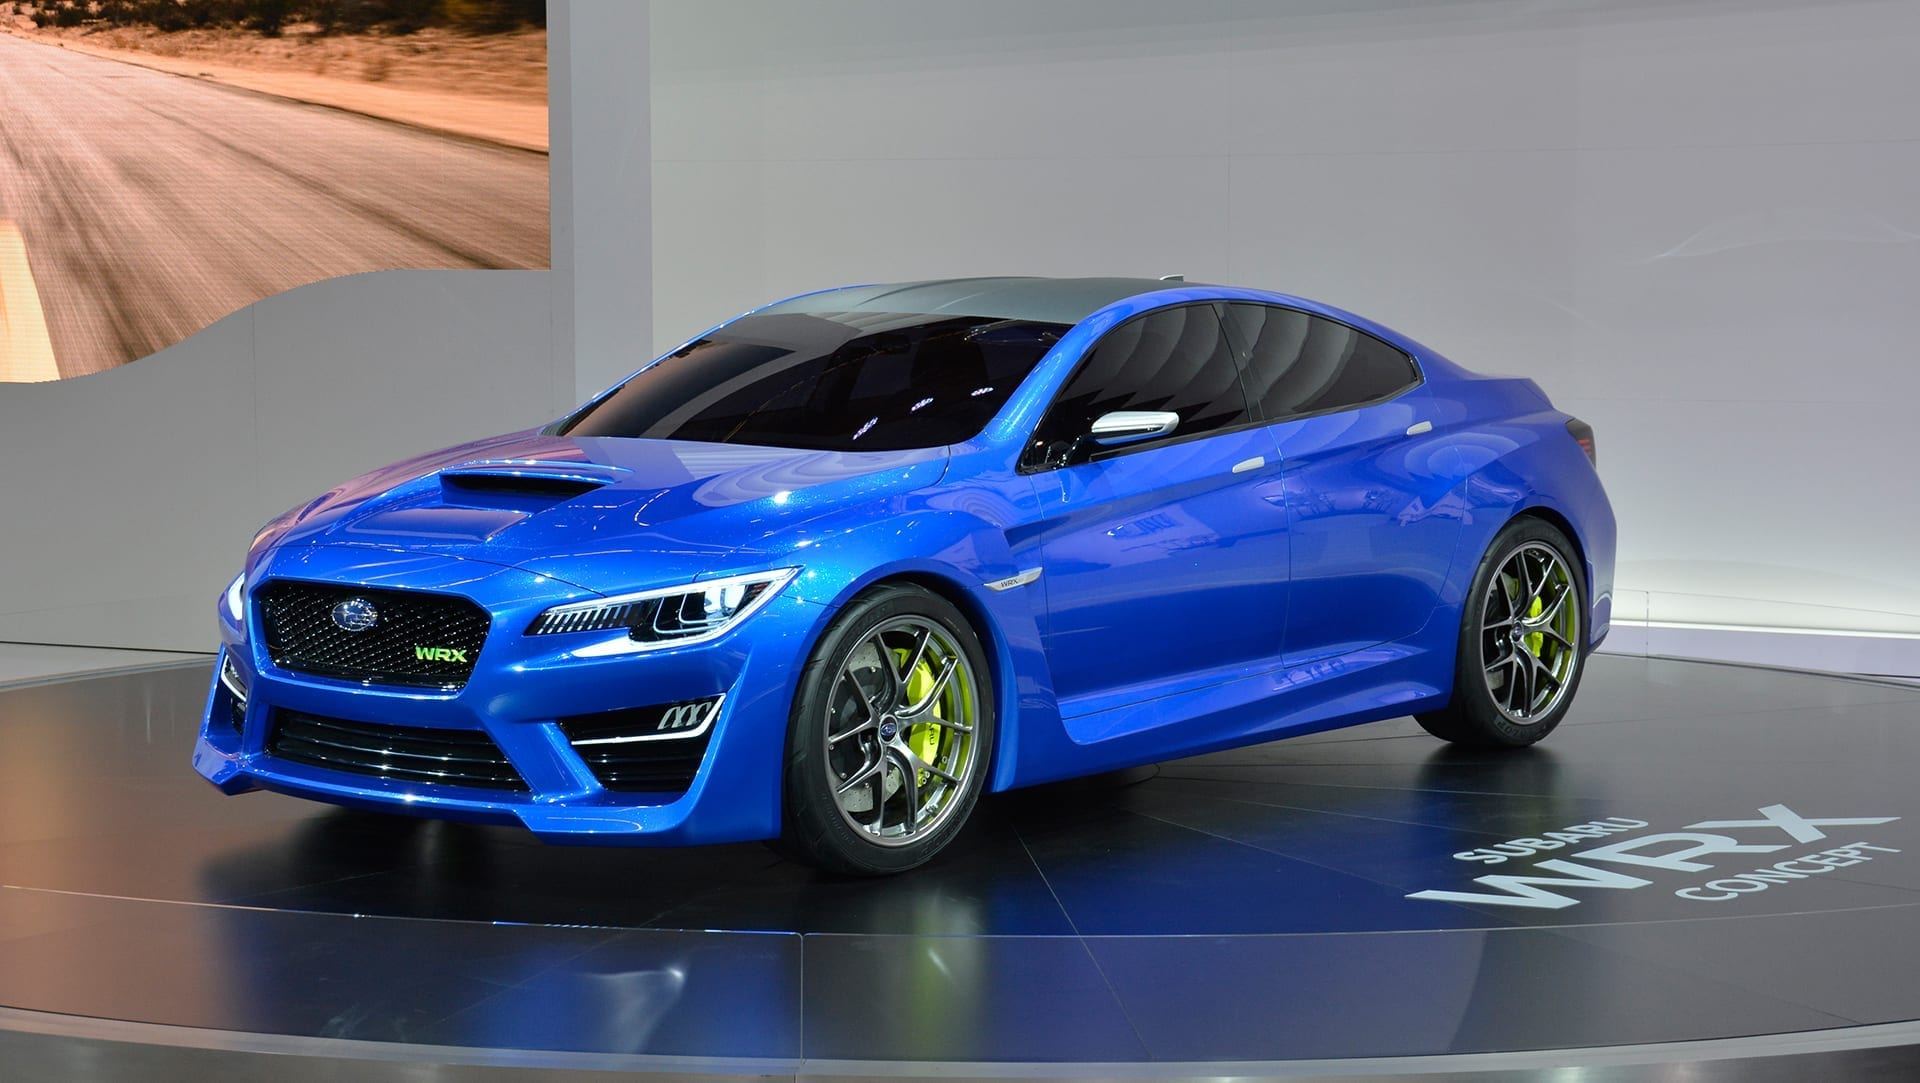 August Automotive Brand Rankings